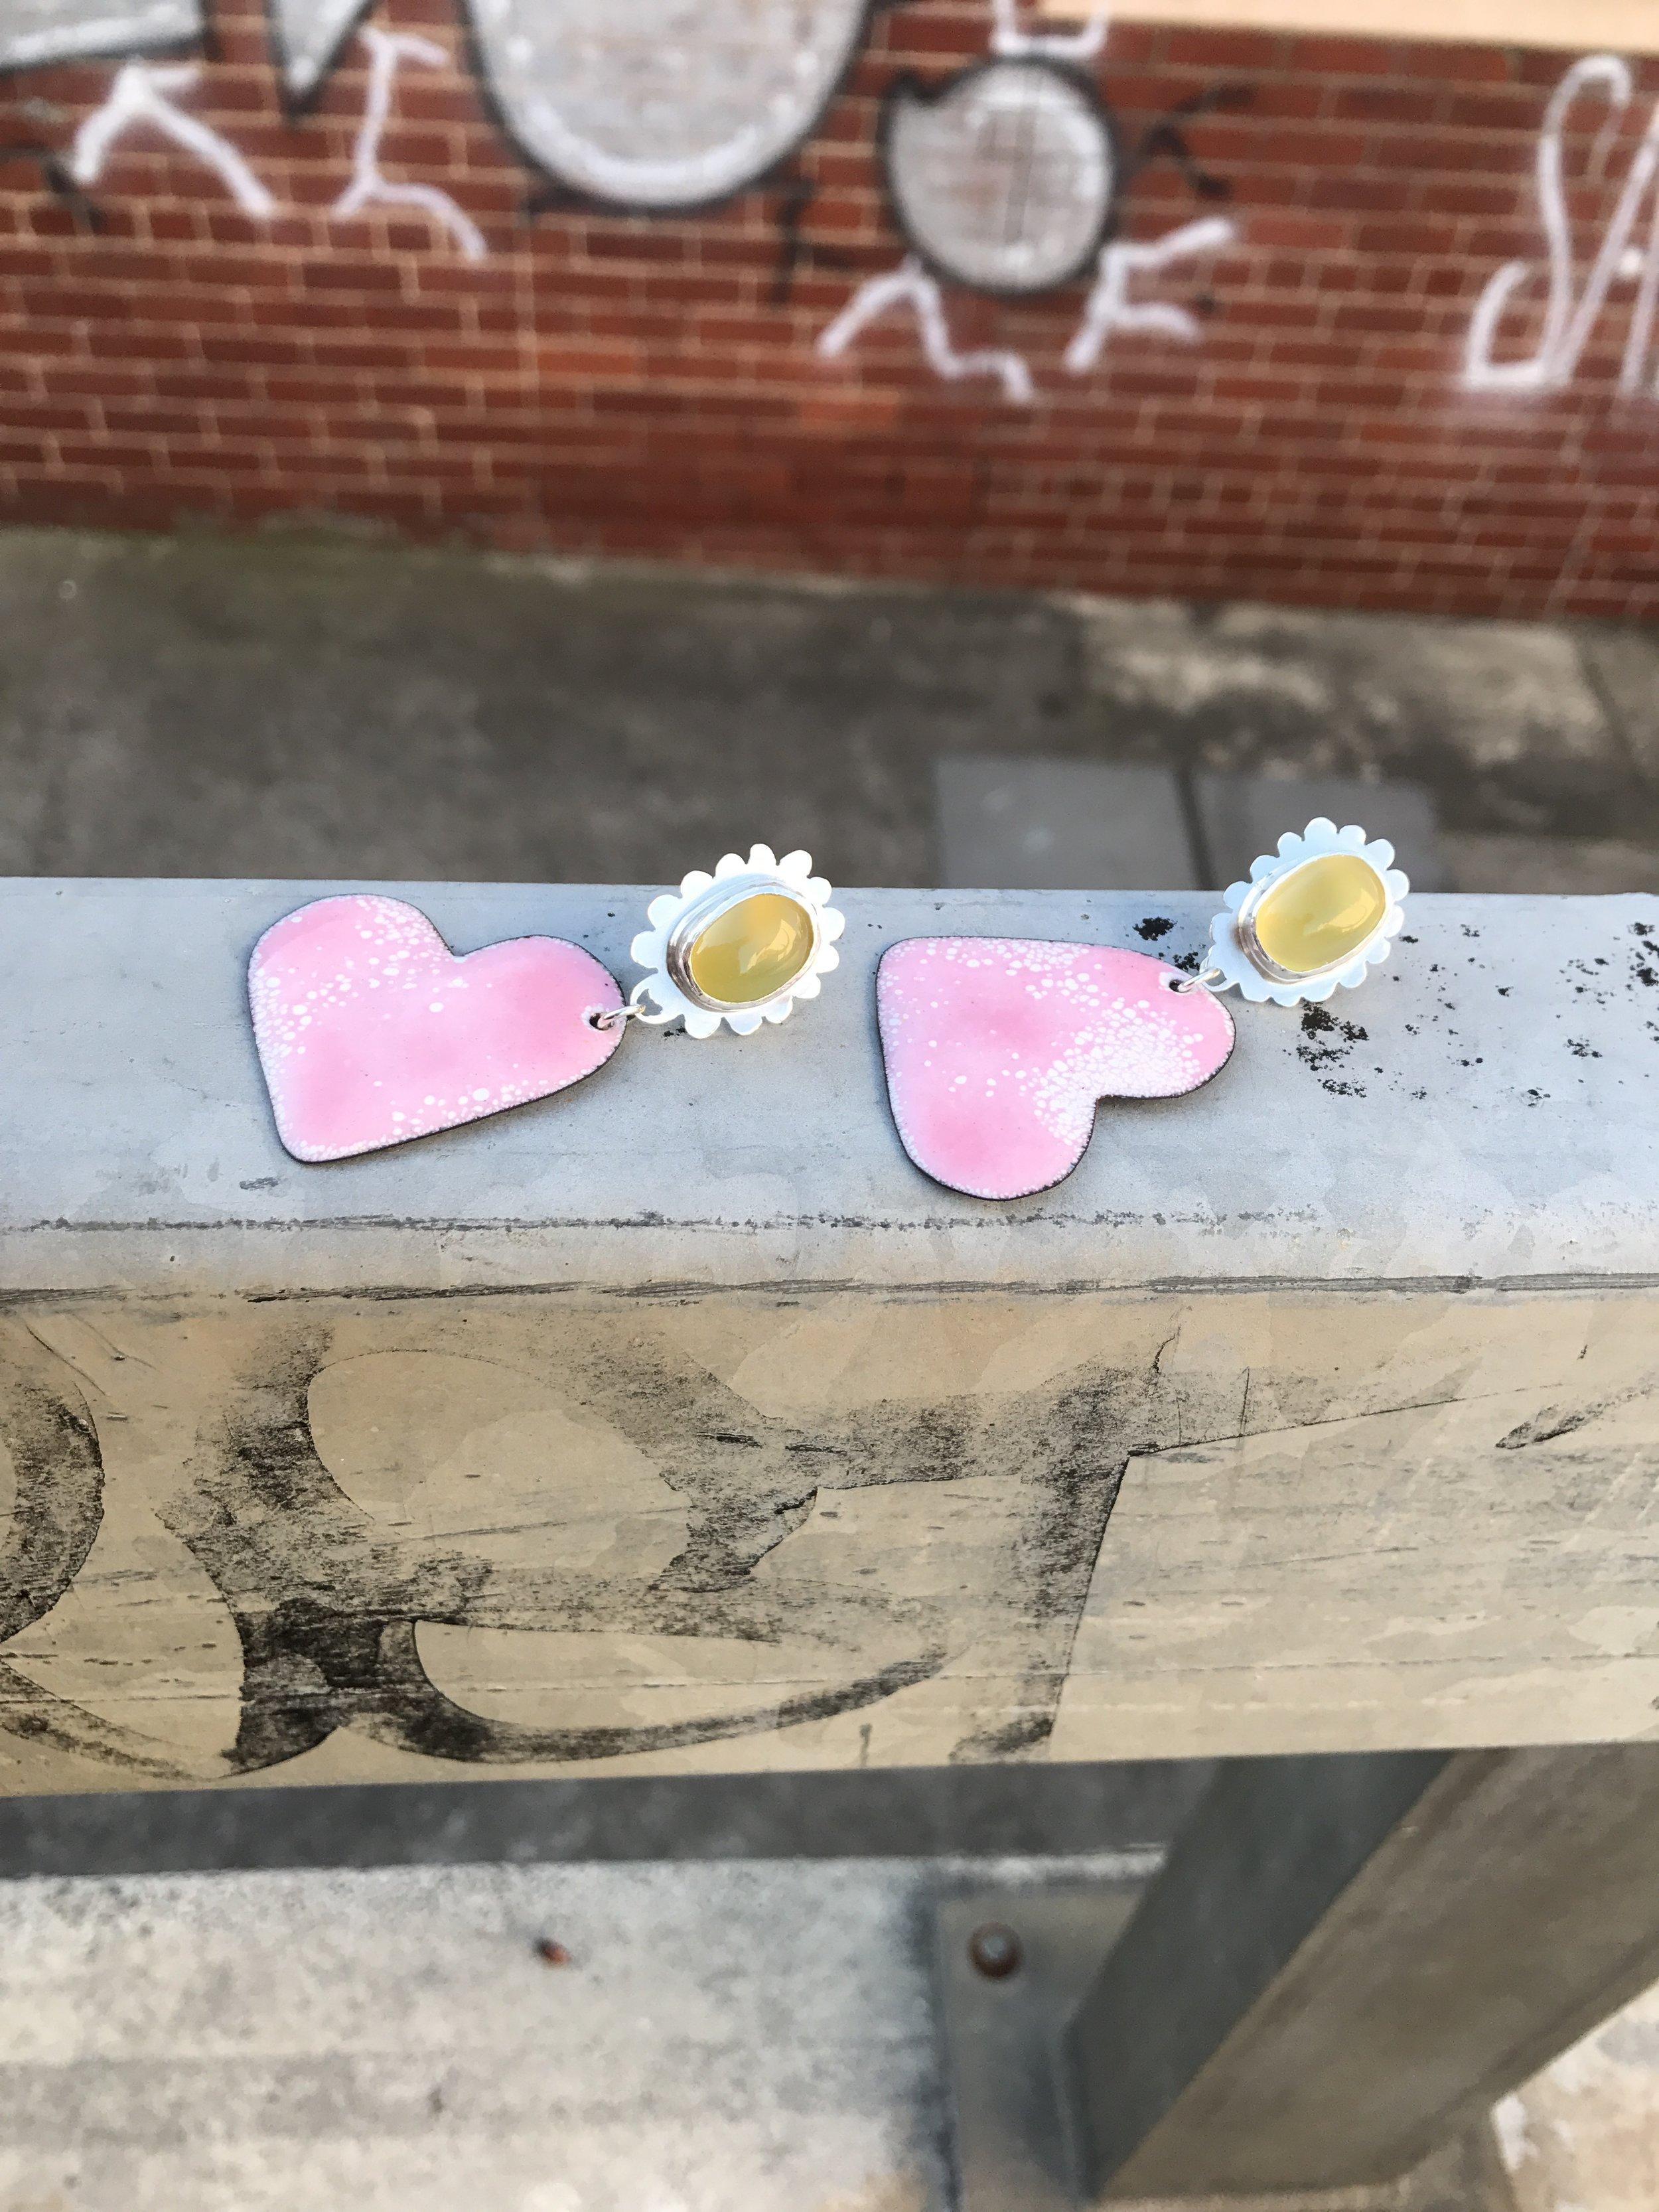 ada-hodgson-contemporary-australian-jewellery-designer-jeweller-design-handmade-mebourne-made-custom-colourful-enamel-sterling-silver-gold-jewelry-statement-ring-necklace-earrings-unique-bespoke